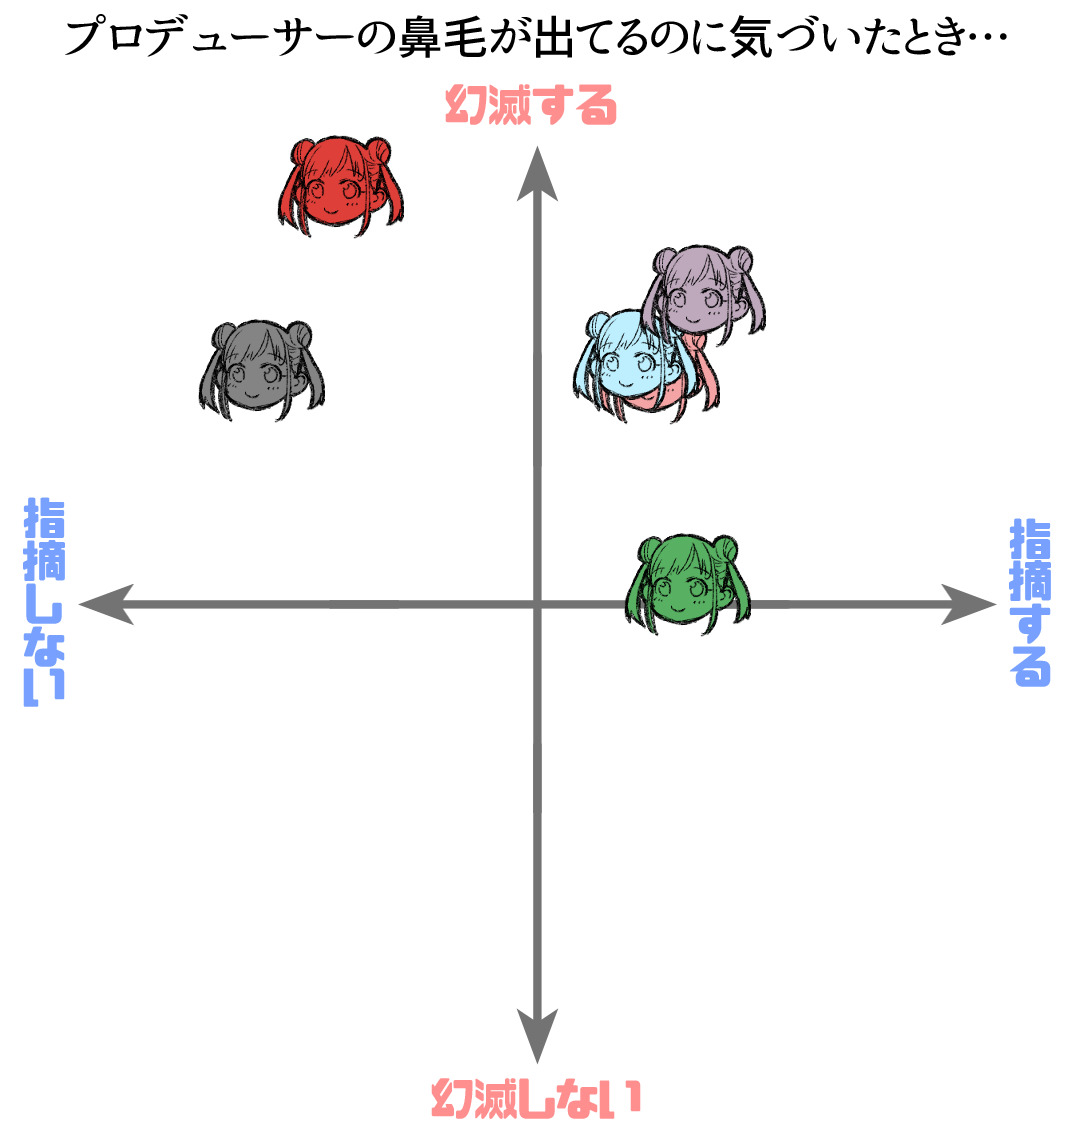 f:id:hoshi_sano:20200414113019j:image:w400